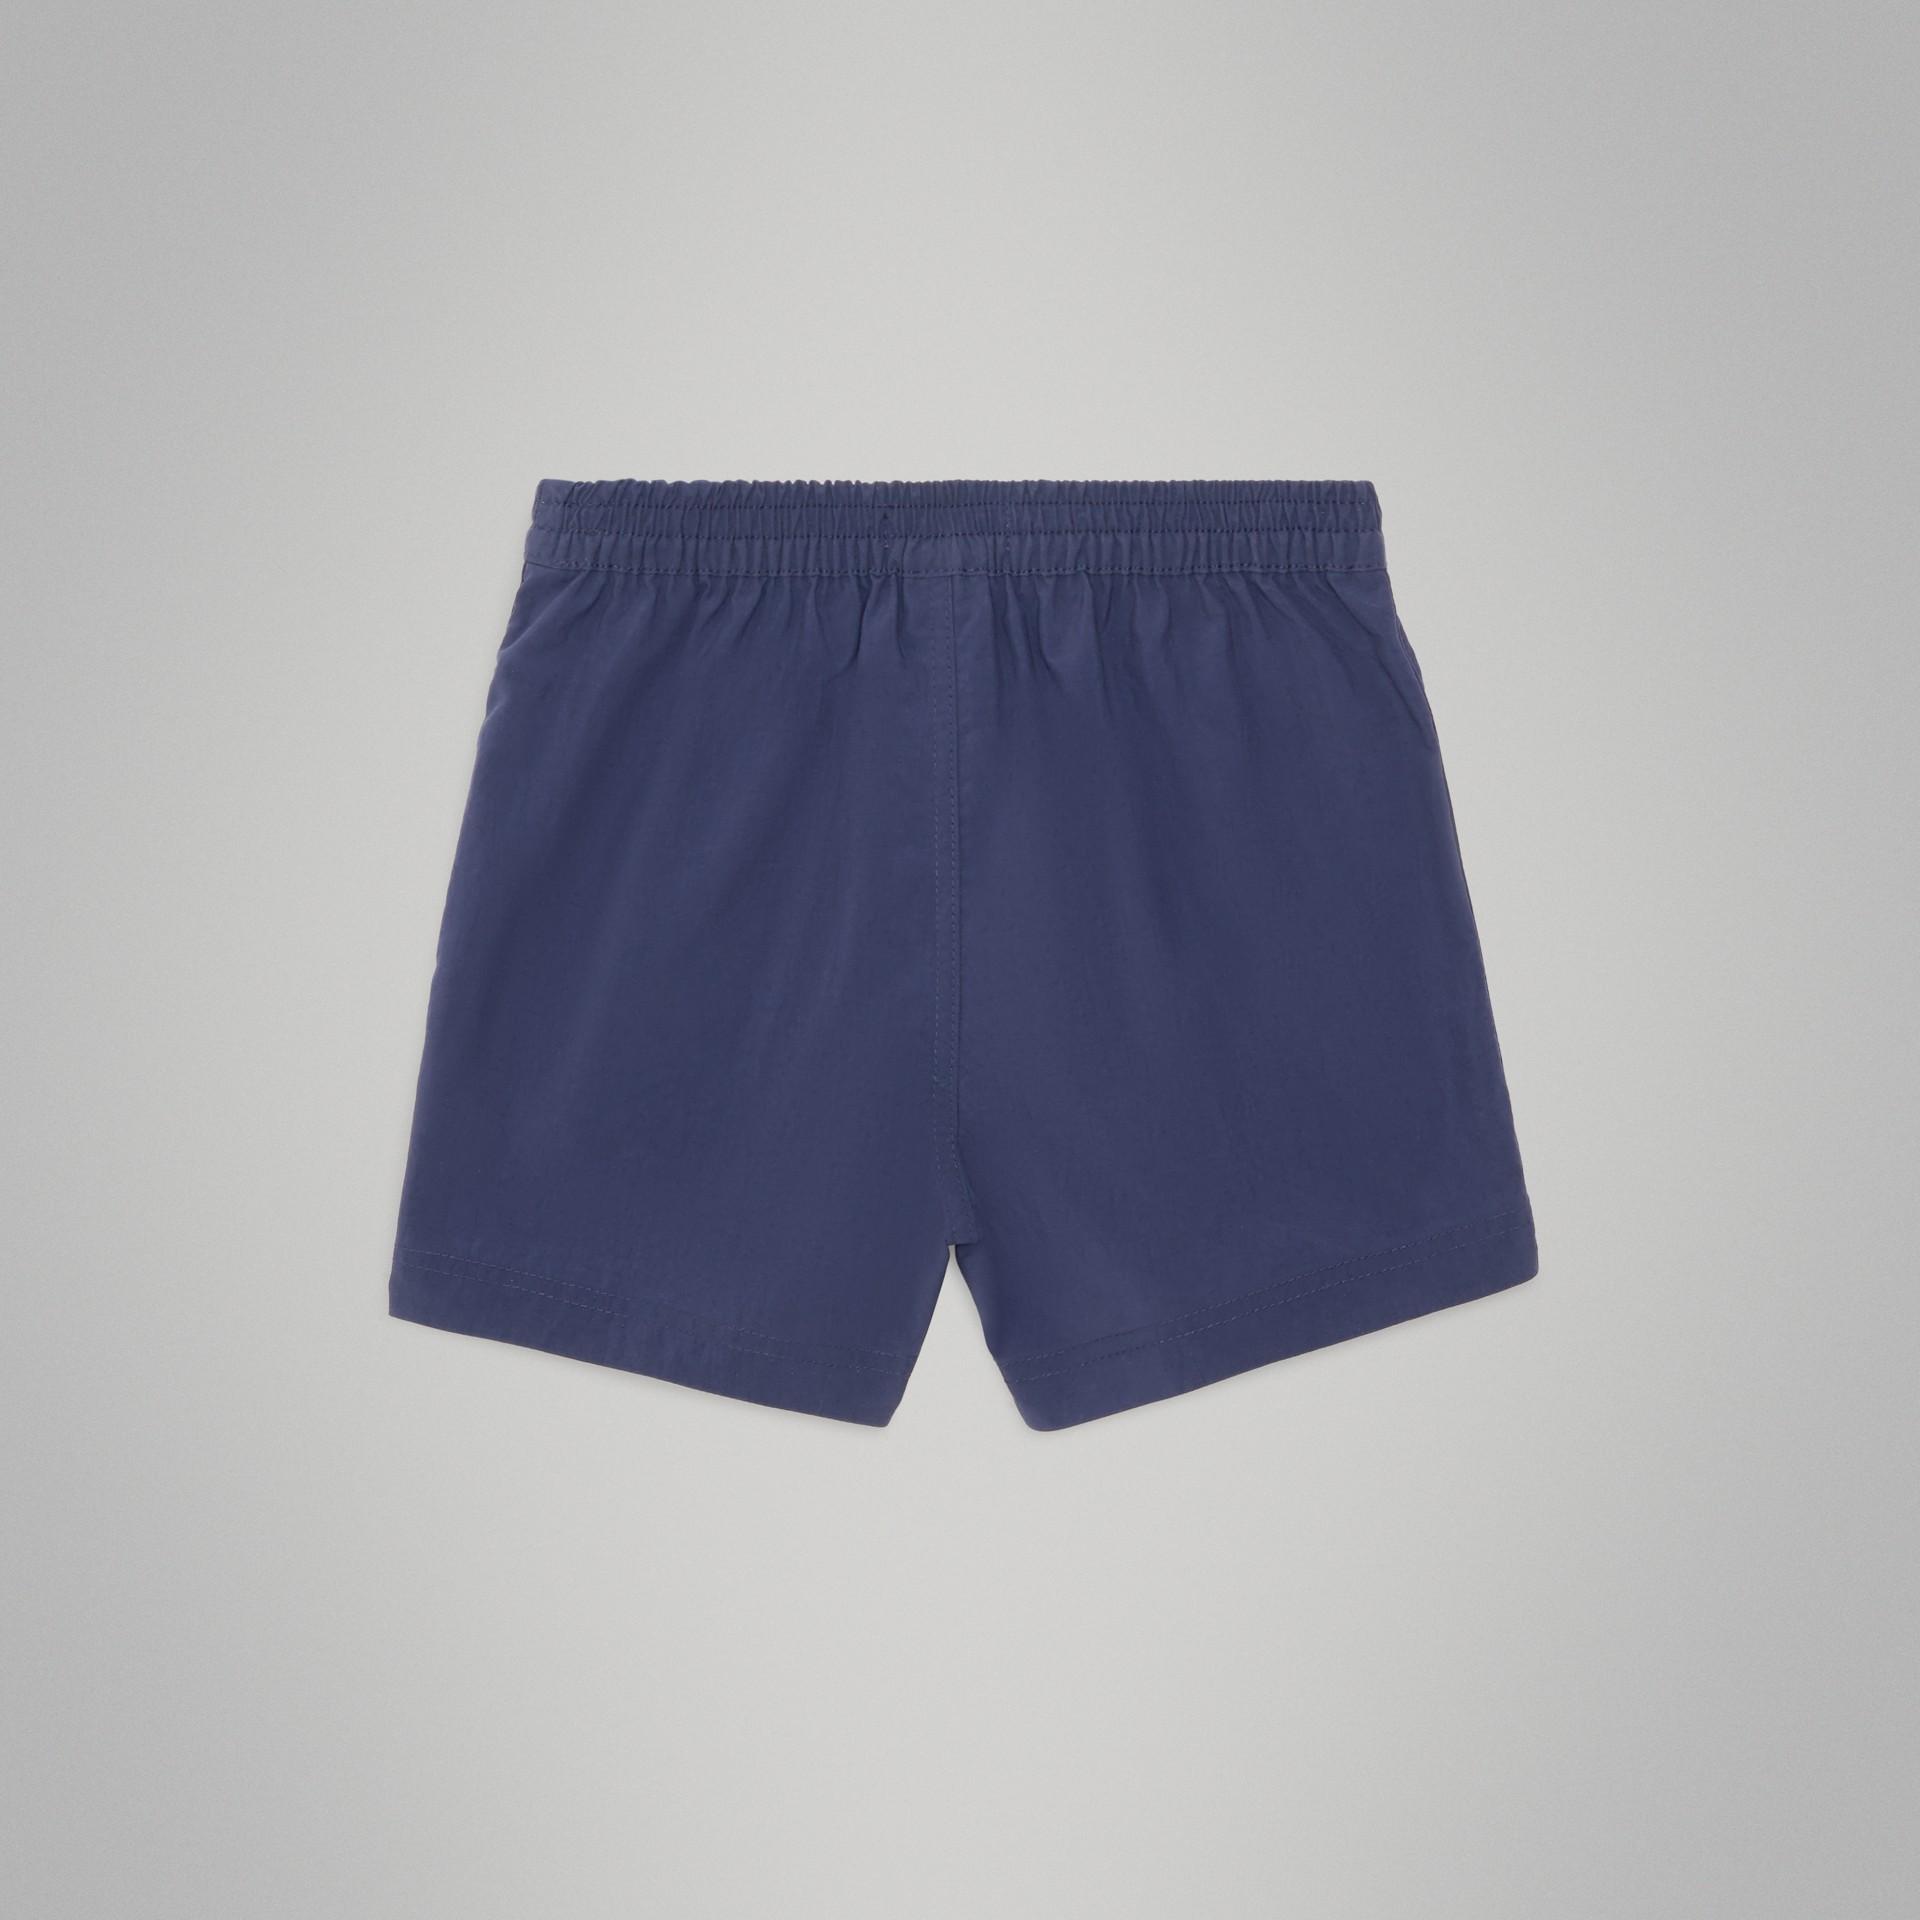 Drawcord Swim Shorts in Indigo - Children | Burberry - gallery image 3